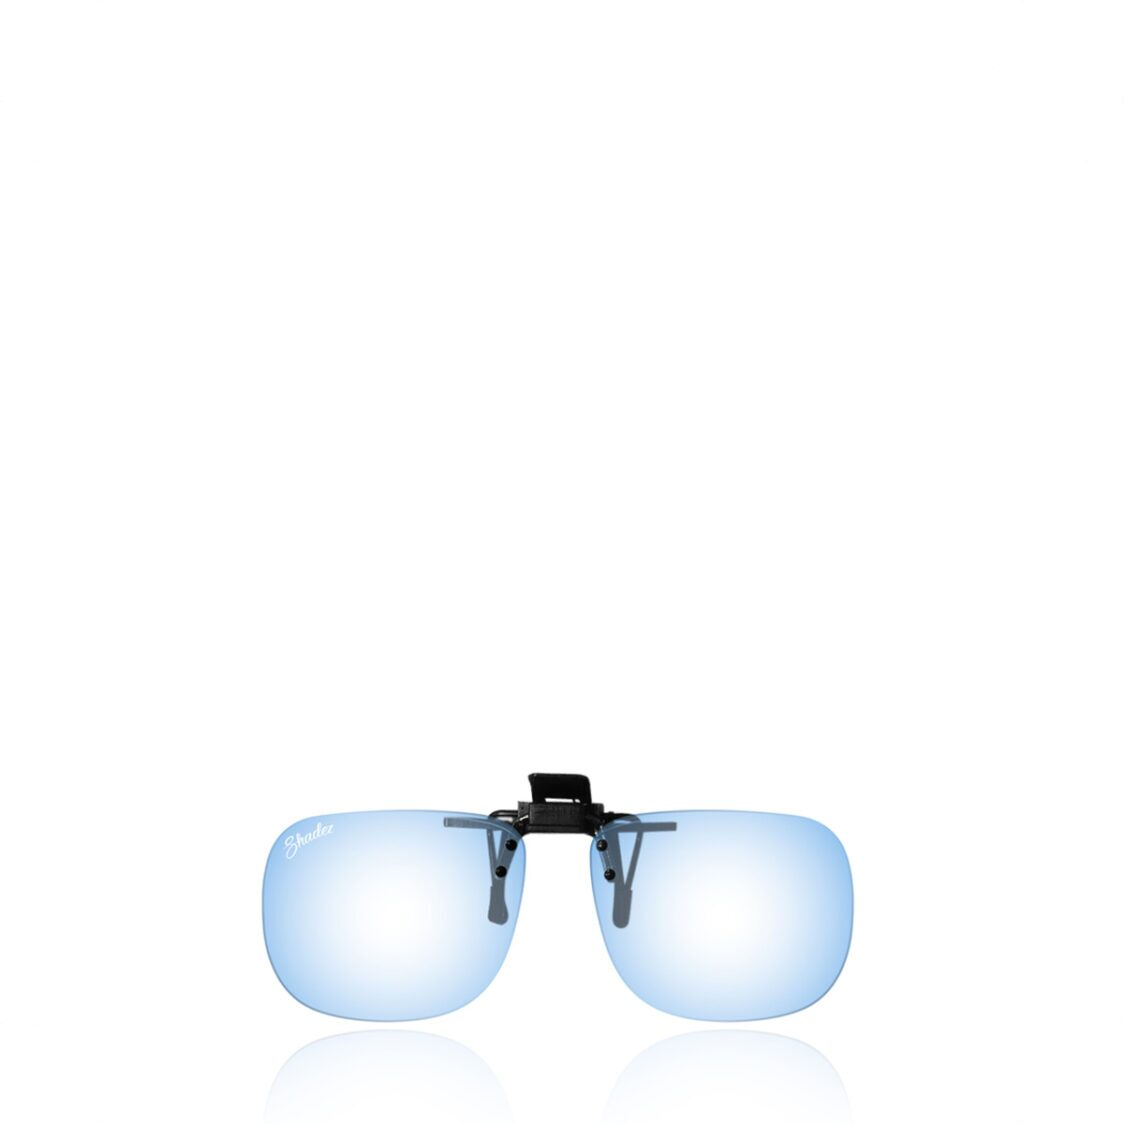 Shadez Eyewear Blue Light Clip On Adult Aged 16 Years  SHZ-311